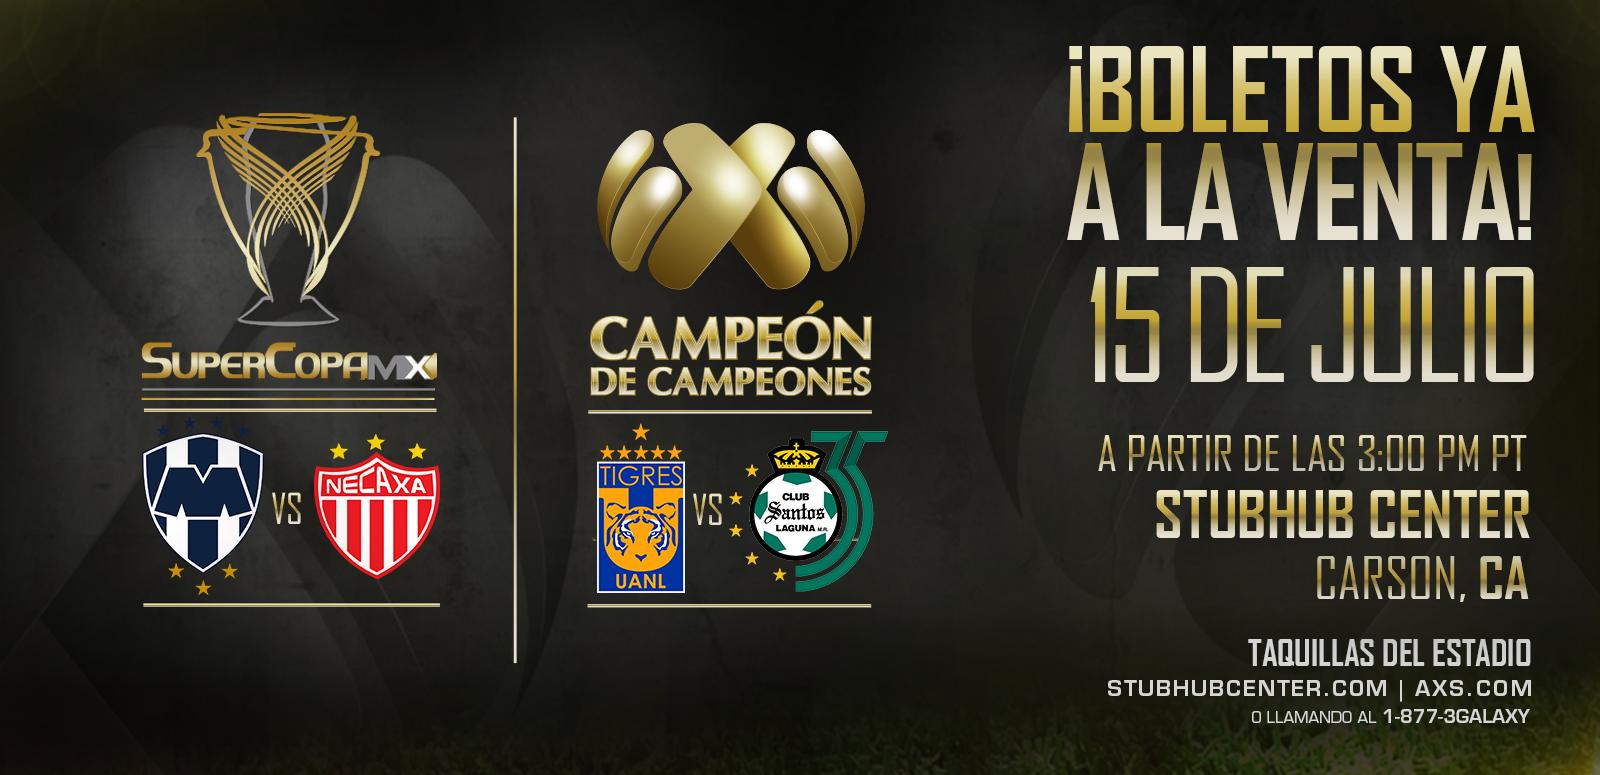 Super Copa MX & Campeon de Campeones 2018